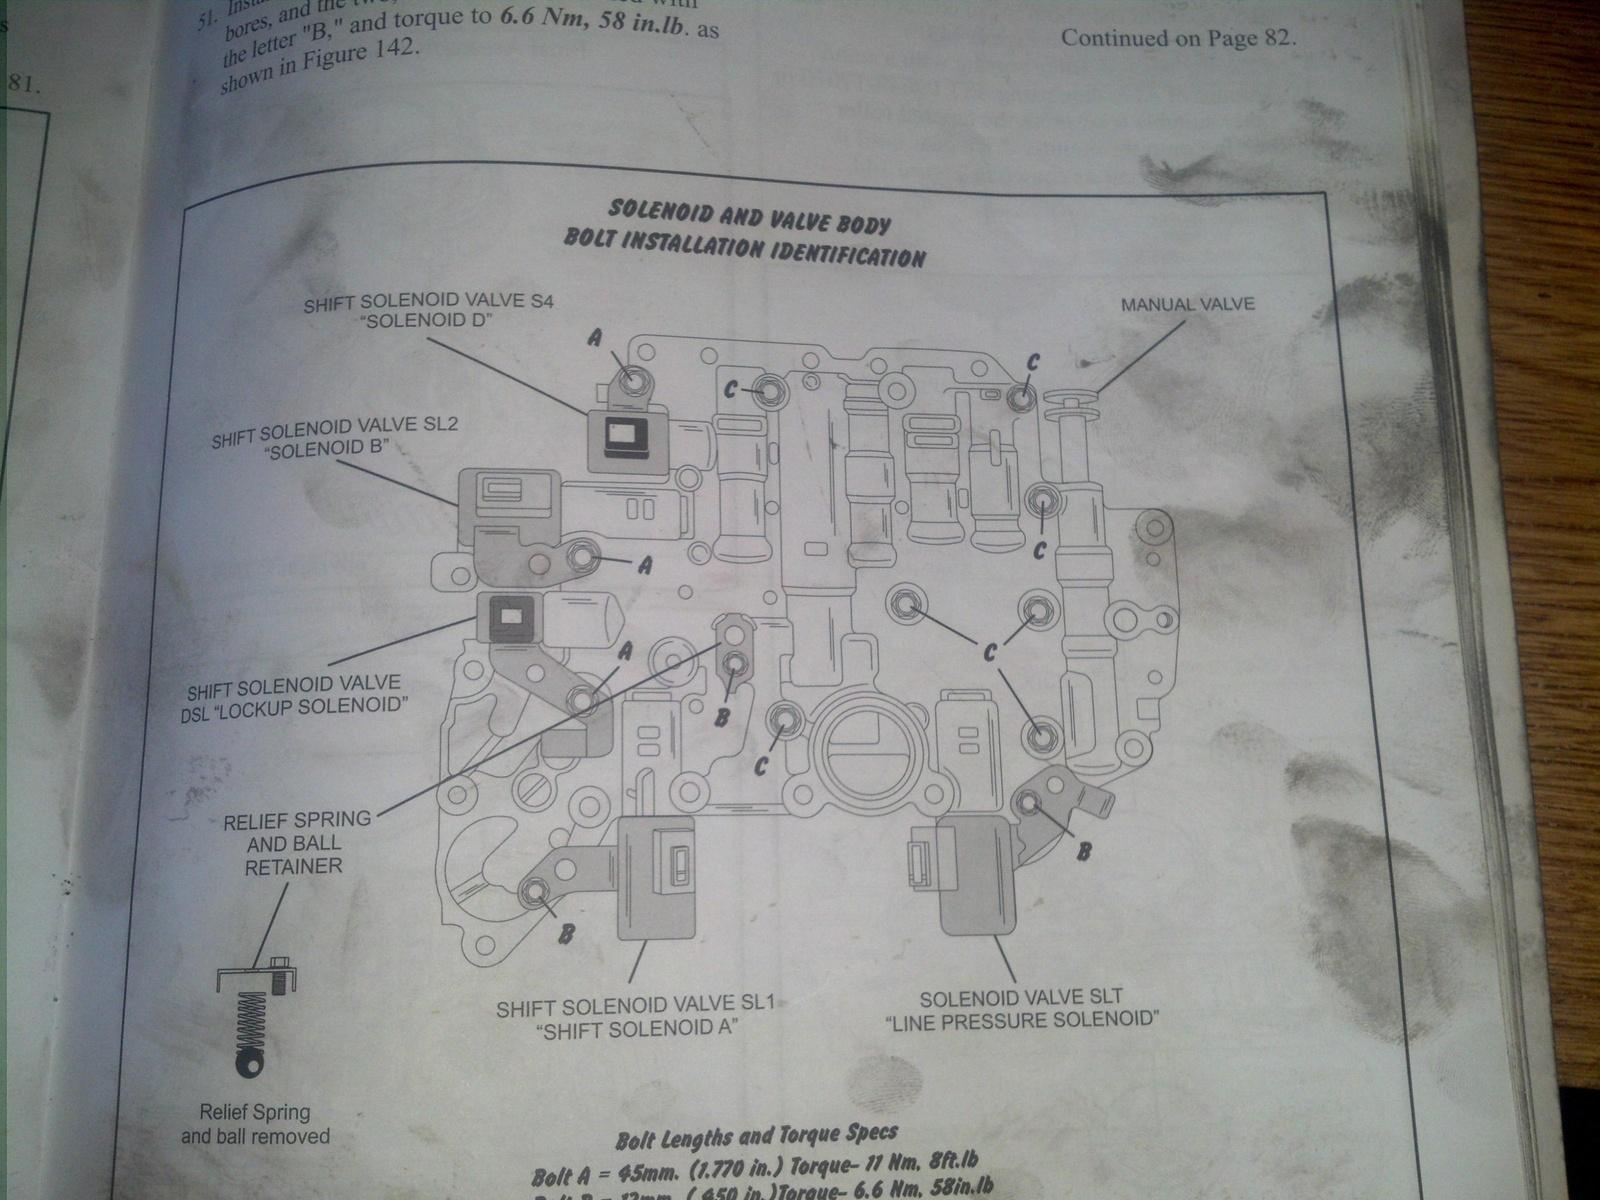 [FPWZ_2684]  NK_2512] Rx 300 Dome Light Wiring Diagram Free Diagram   Lexus Rx300 Lights Wiring Diagram      Ropye Sputa Garna Garna Mohammedshrine Librar Wiring 101